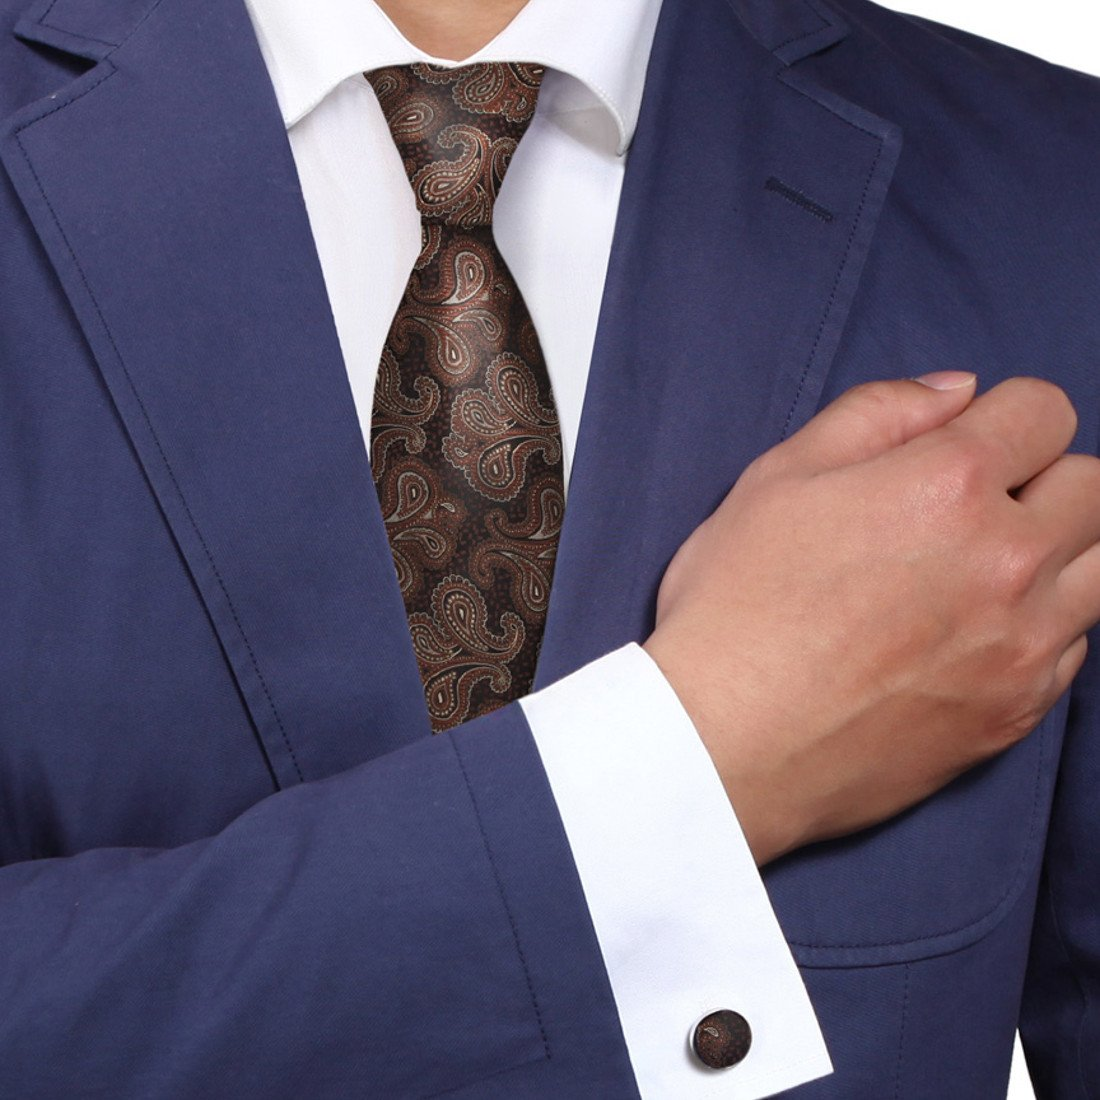 Y&G A1130 Rosy Brown Patterned School Presents Mens Black Economics Gift Silk Tie Cufflinks Set 2PT